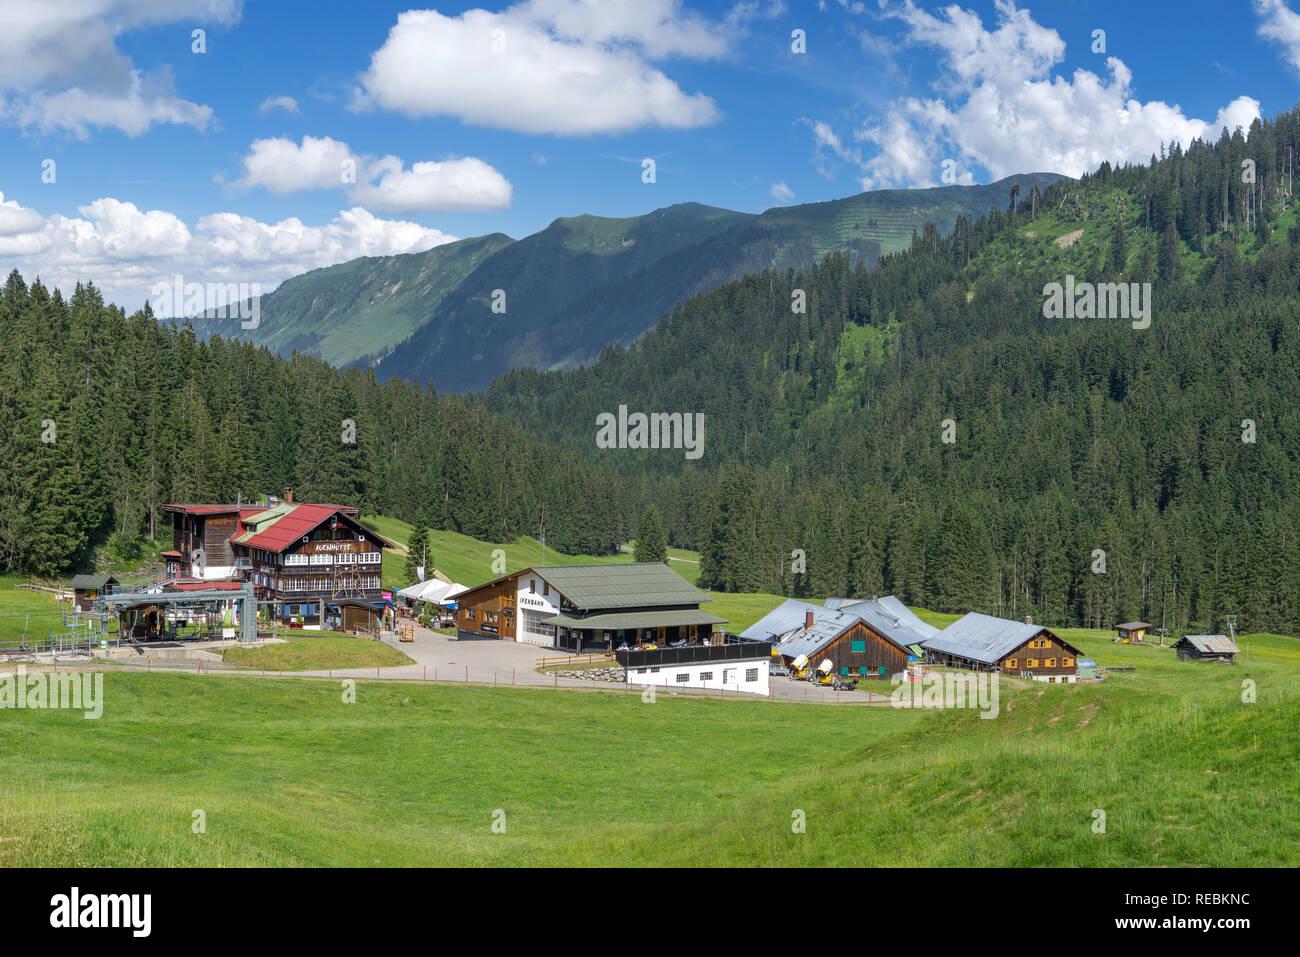 Valley station of the mountain railway Ifenbahn in the Kleinwalsertal - Stock Image